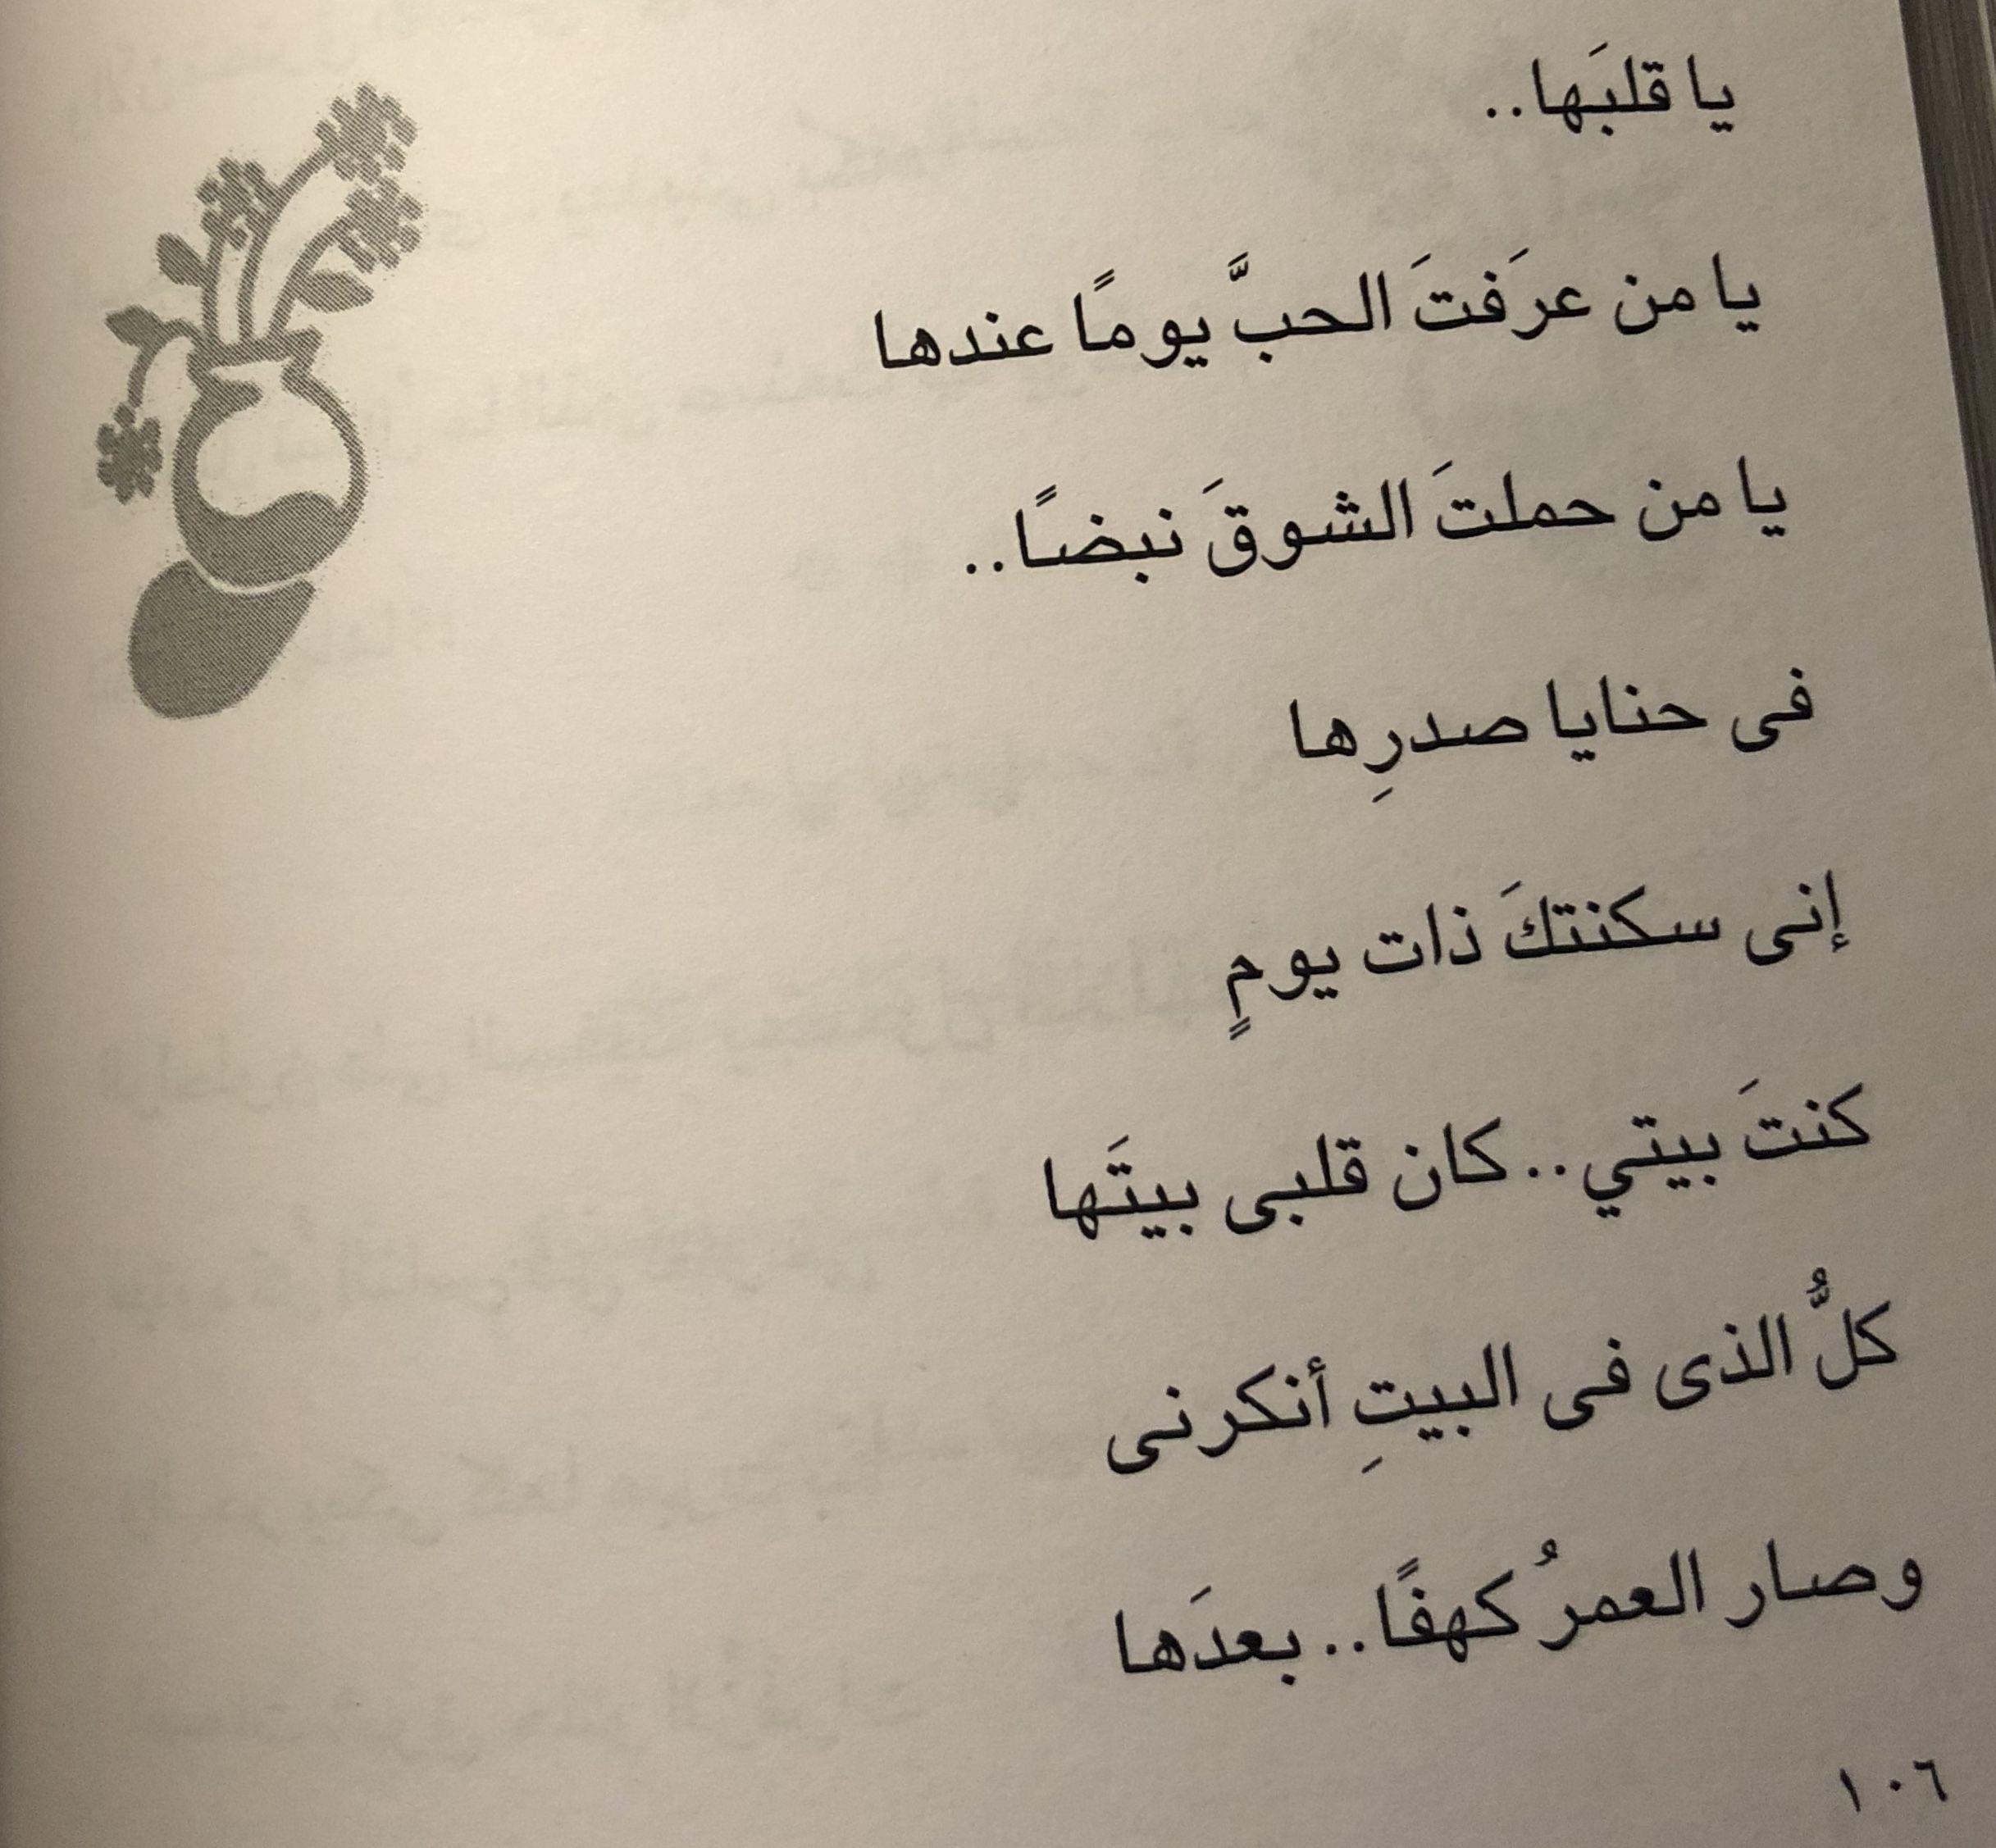 فاروق جويدة Words Quotes Quotations Morning Quotes